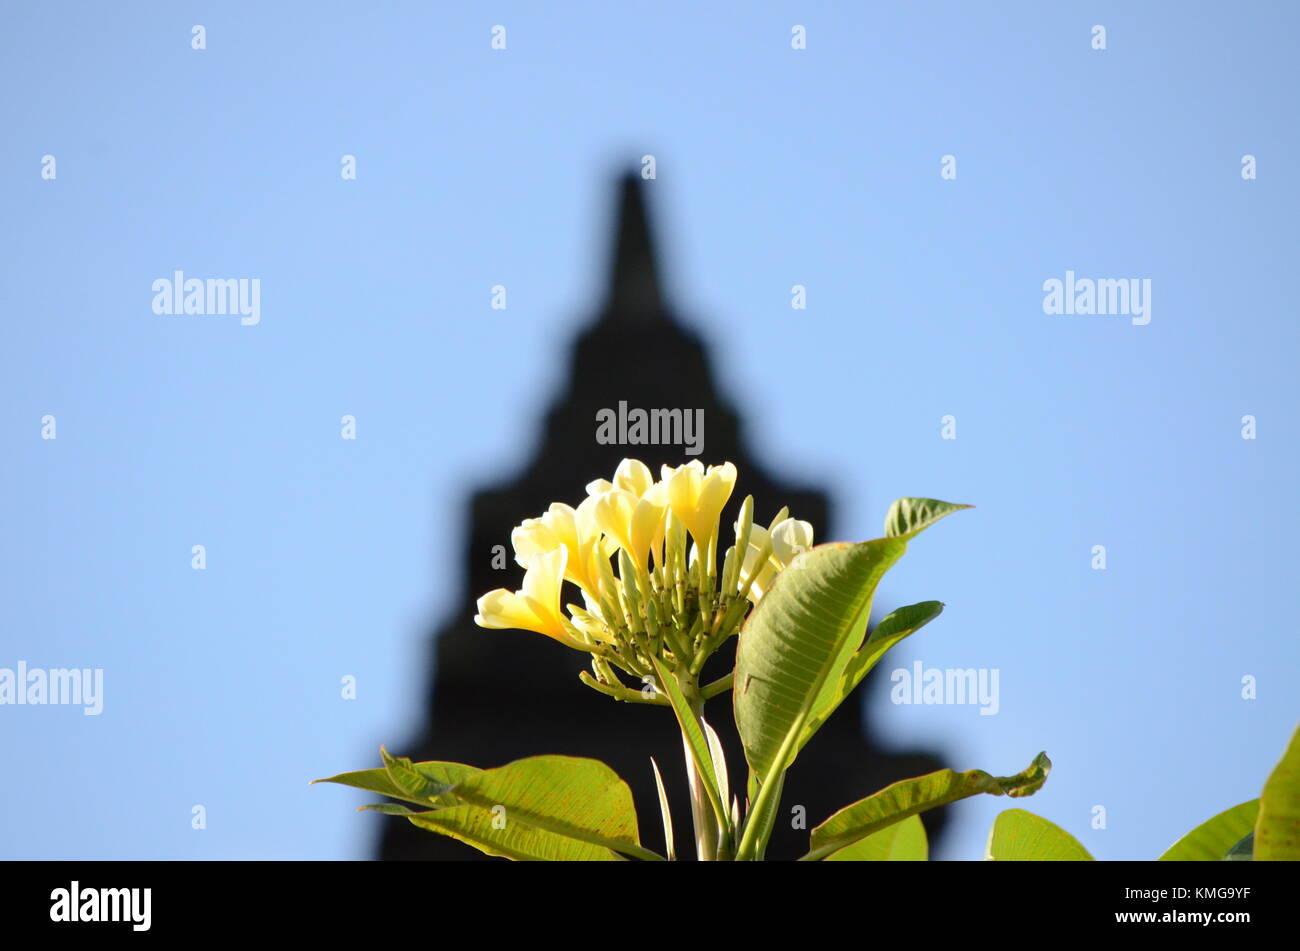 Frangipani flower inside Pura Parahyangan Agung Jagatkarta -Taman Sari Gunung Salak, Bogor - West Java - Stock Image